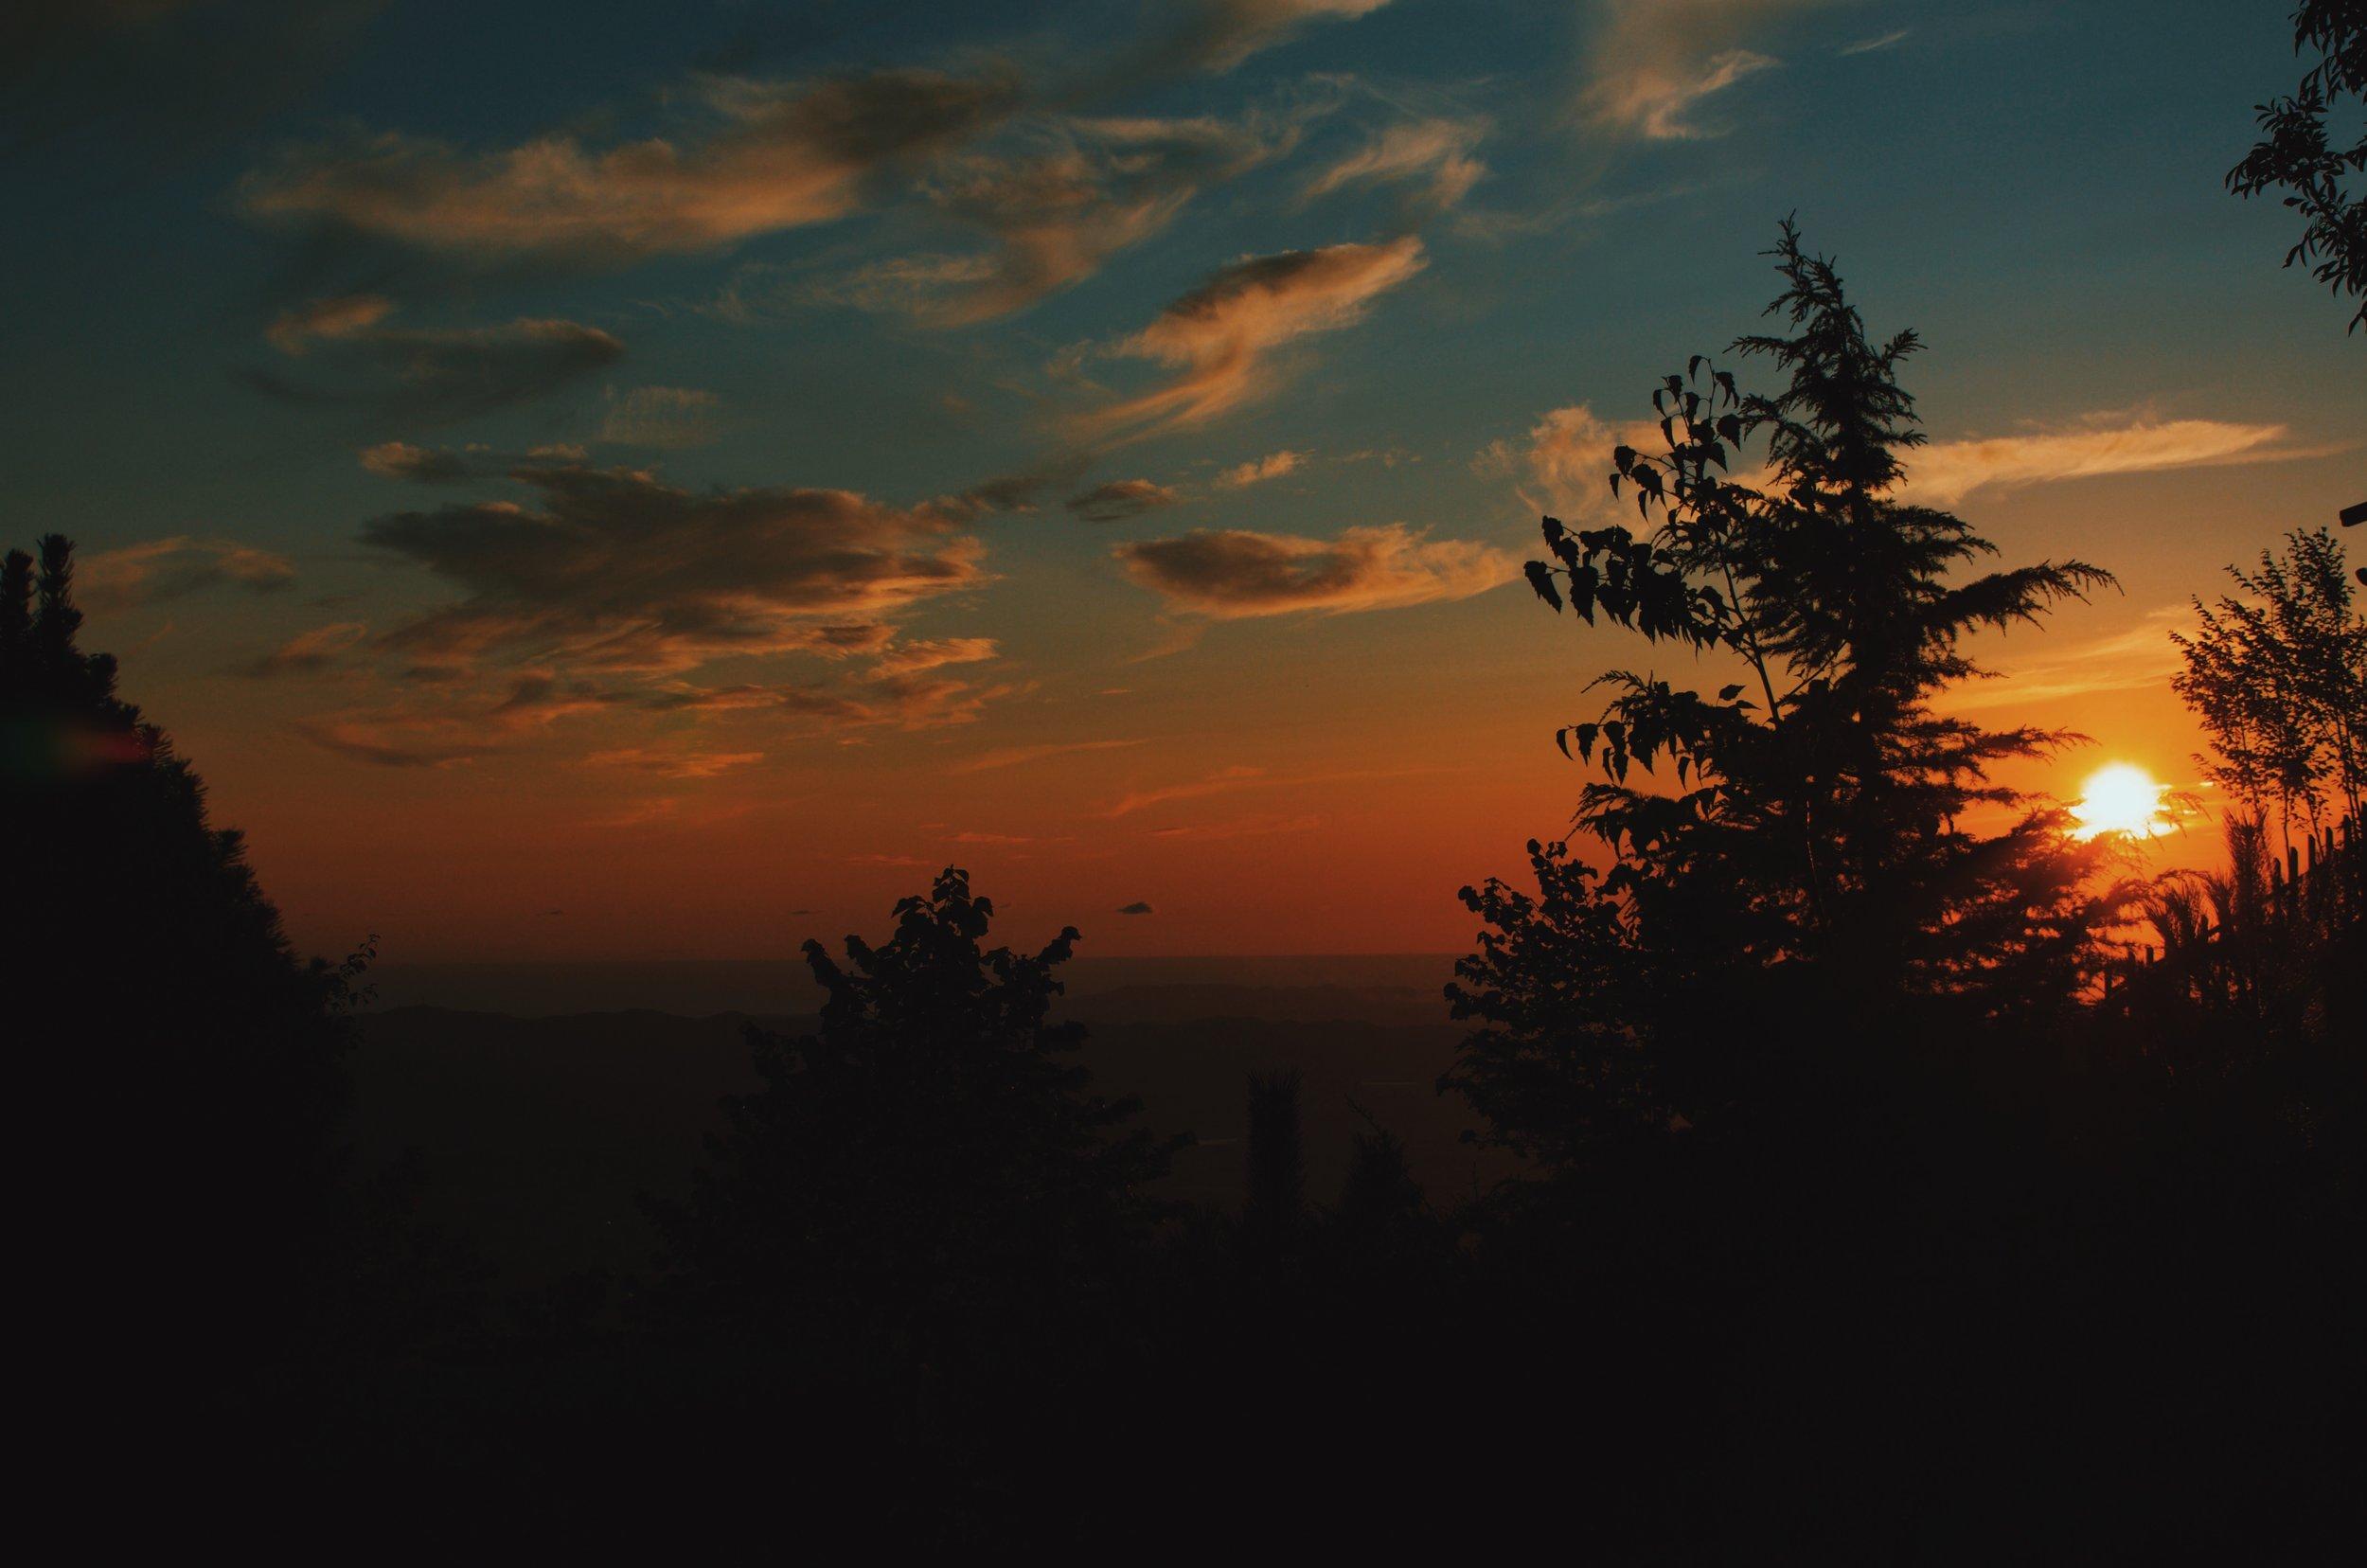 Sunset in Albania